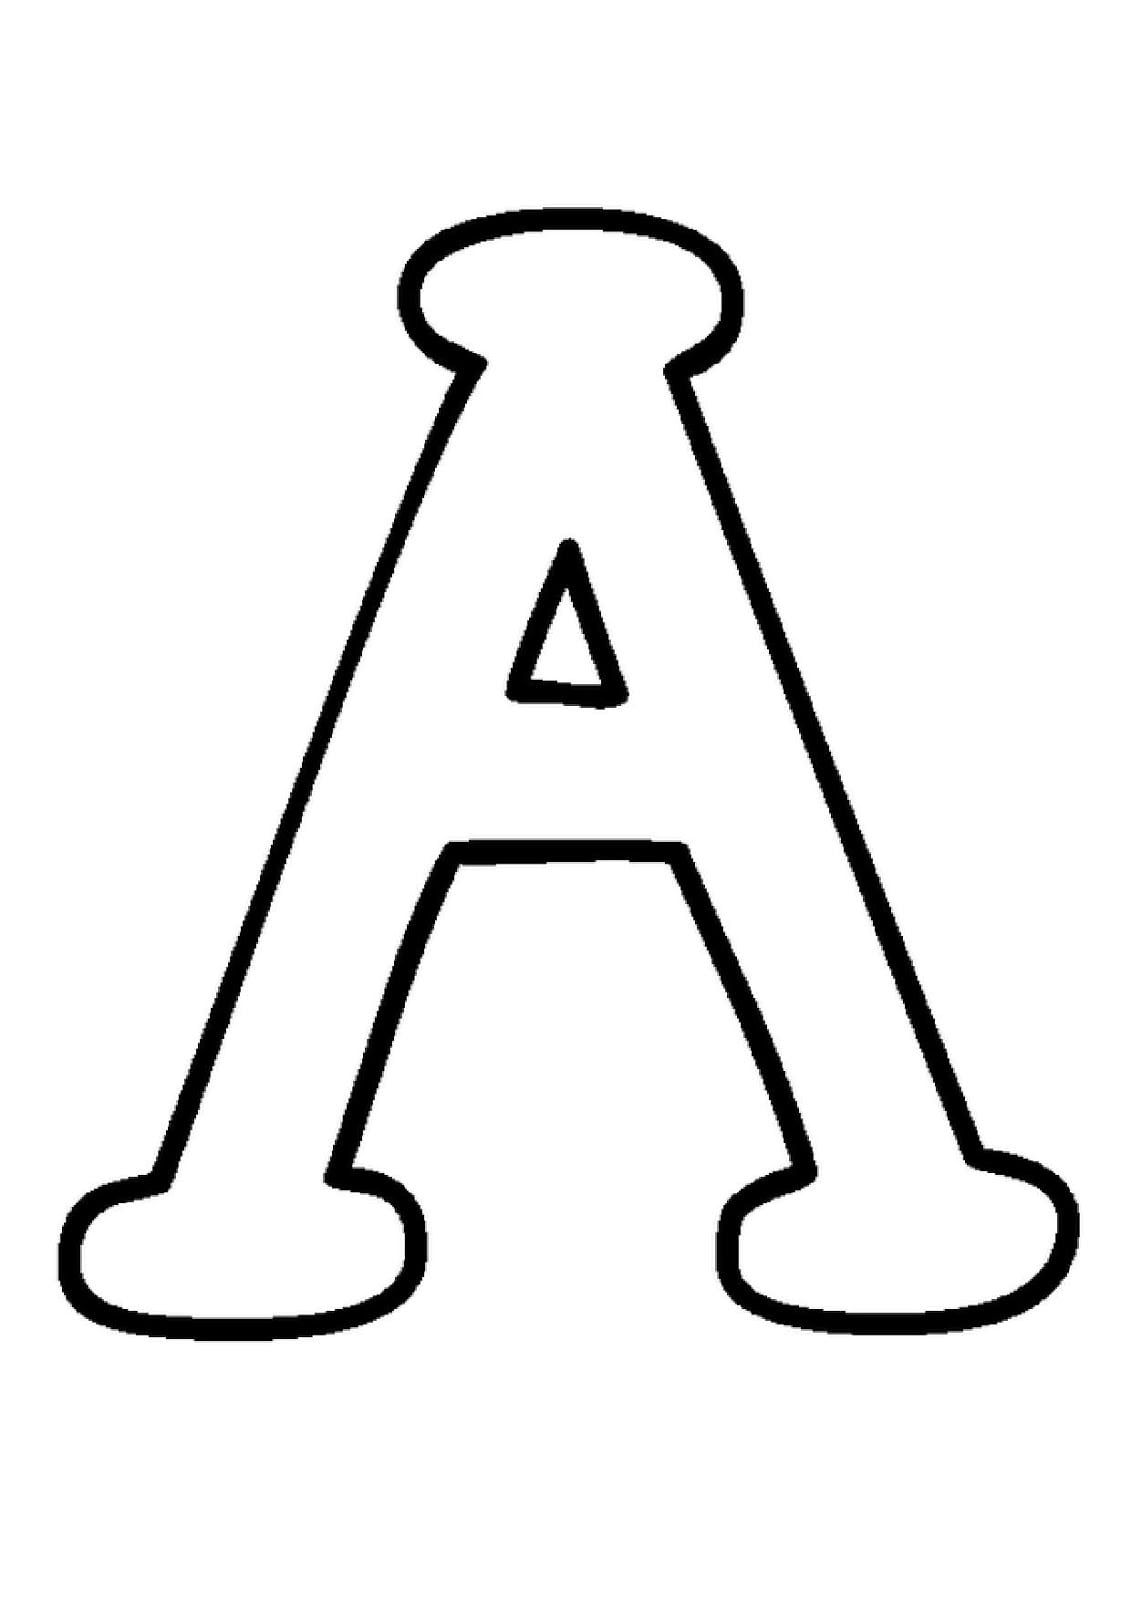 Imprimir Letras Do Alfabeto